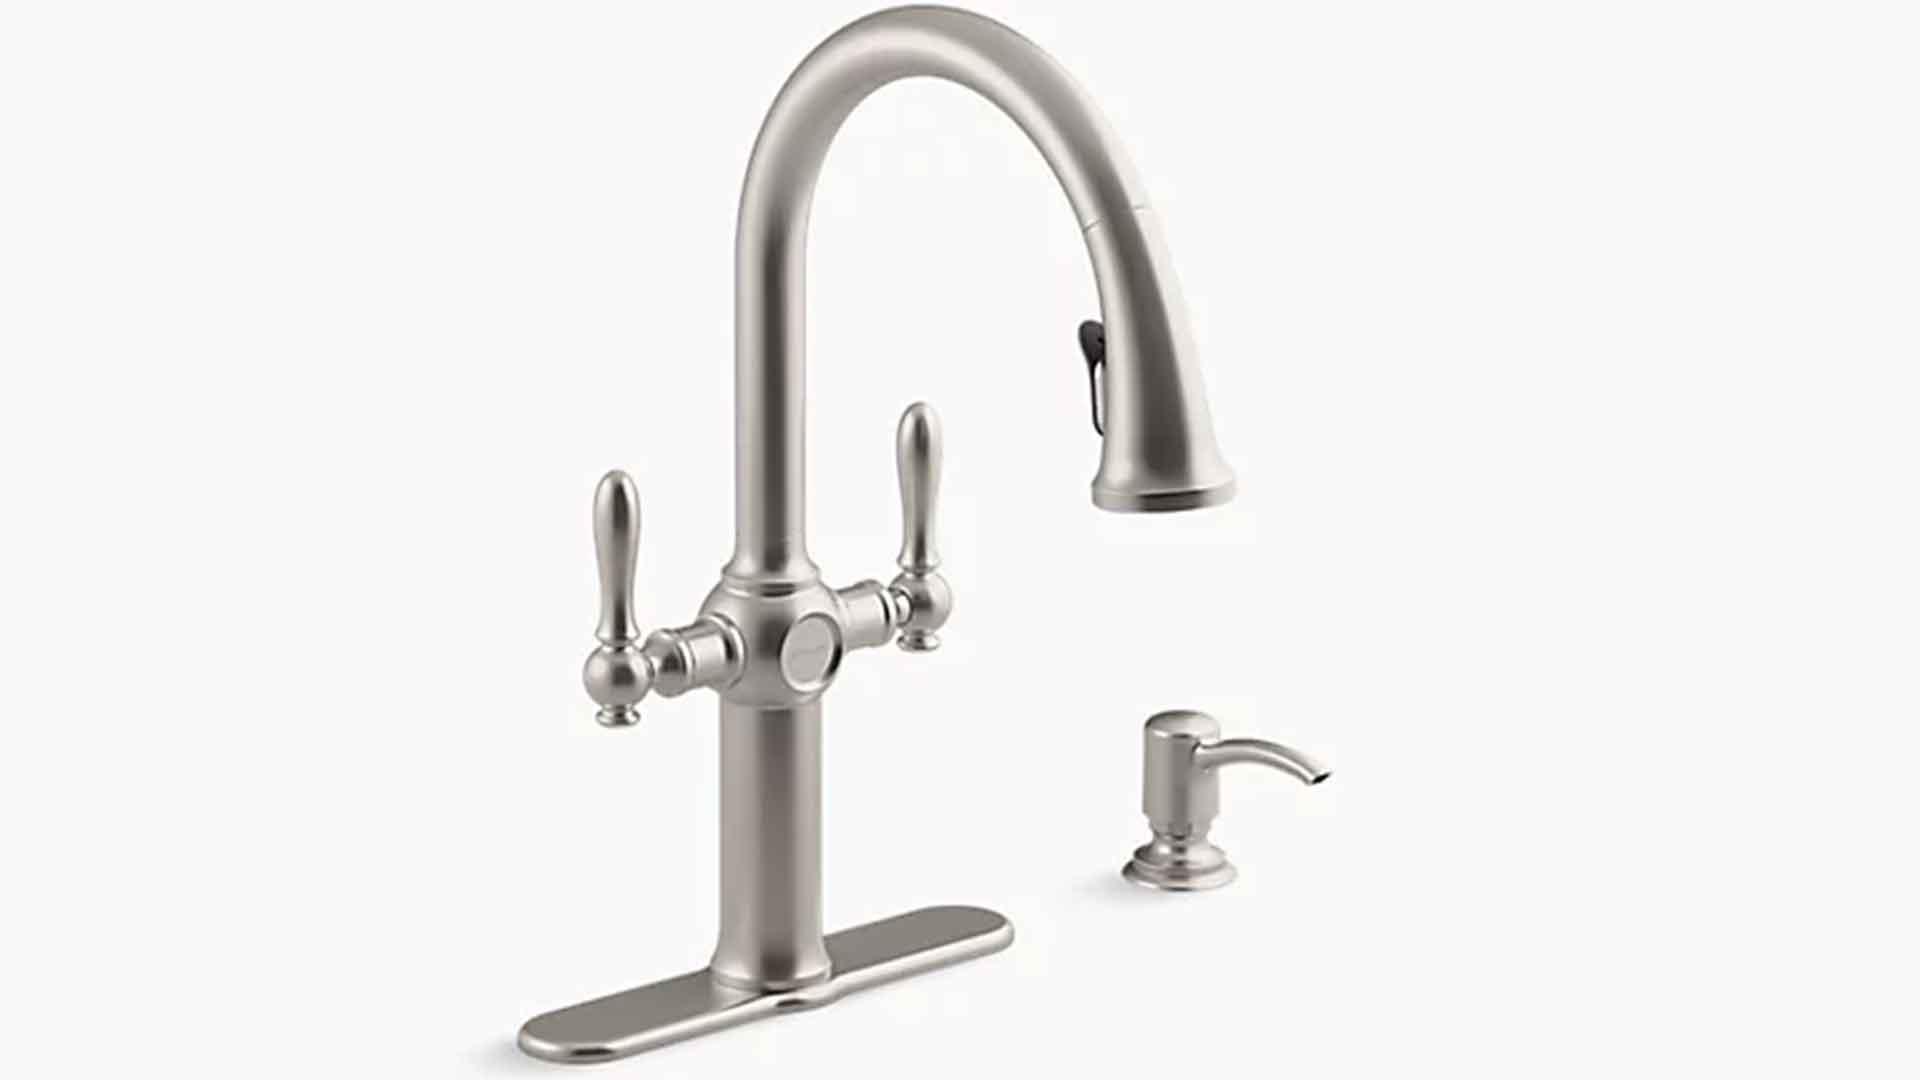 kohler Two Handle Faucets